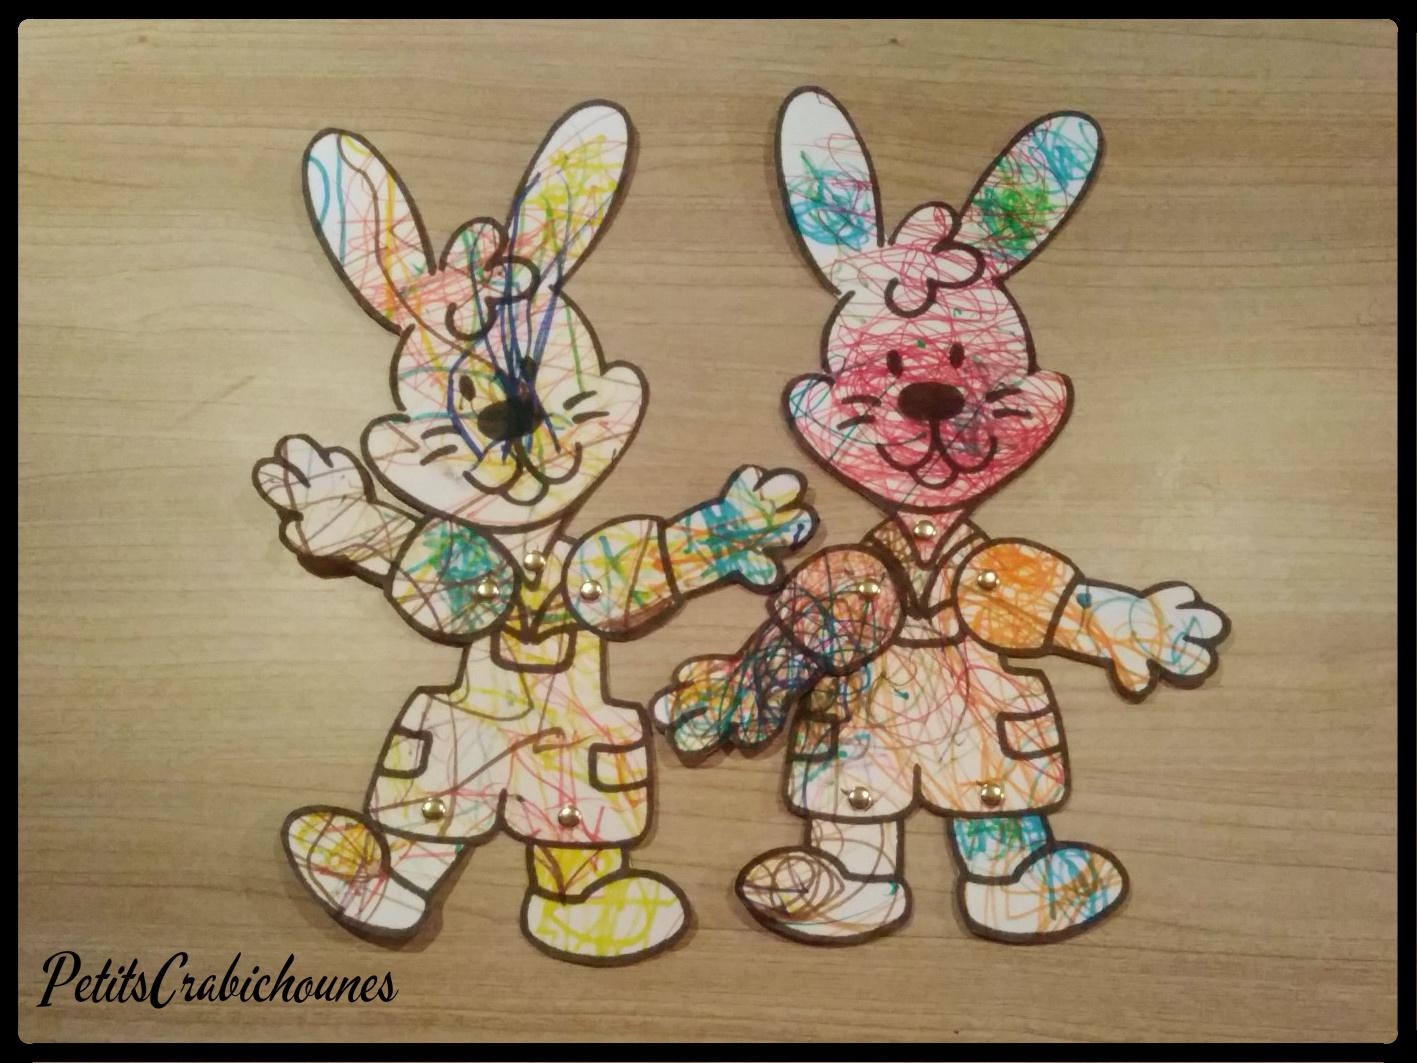 Lapins De Pâques, Pantins Articulés. - Petits Crabichounes avec Pantins Articulés À Imprimer